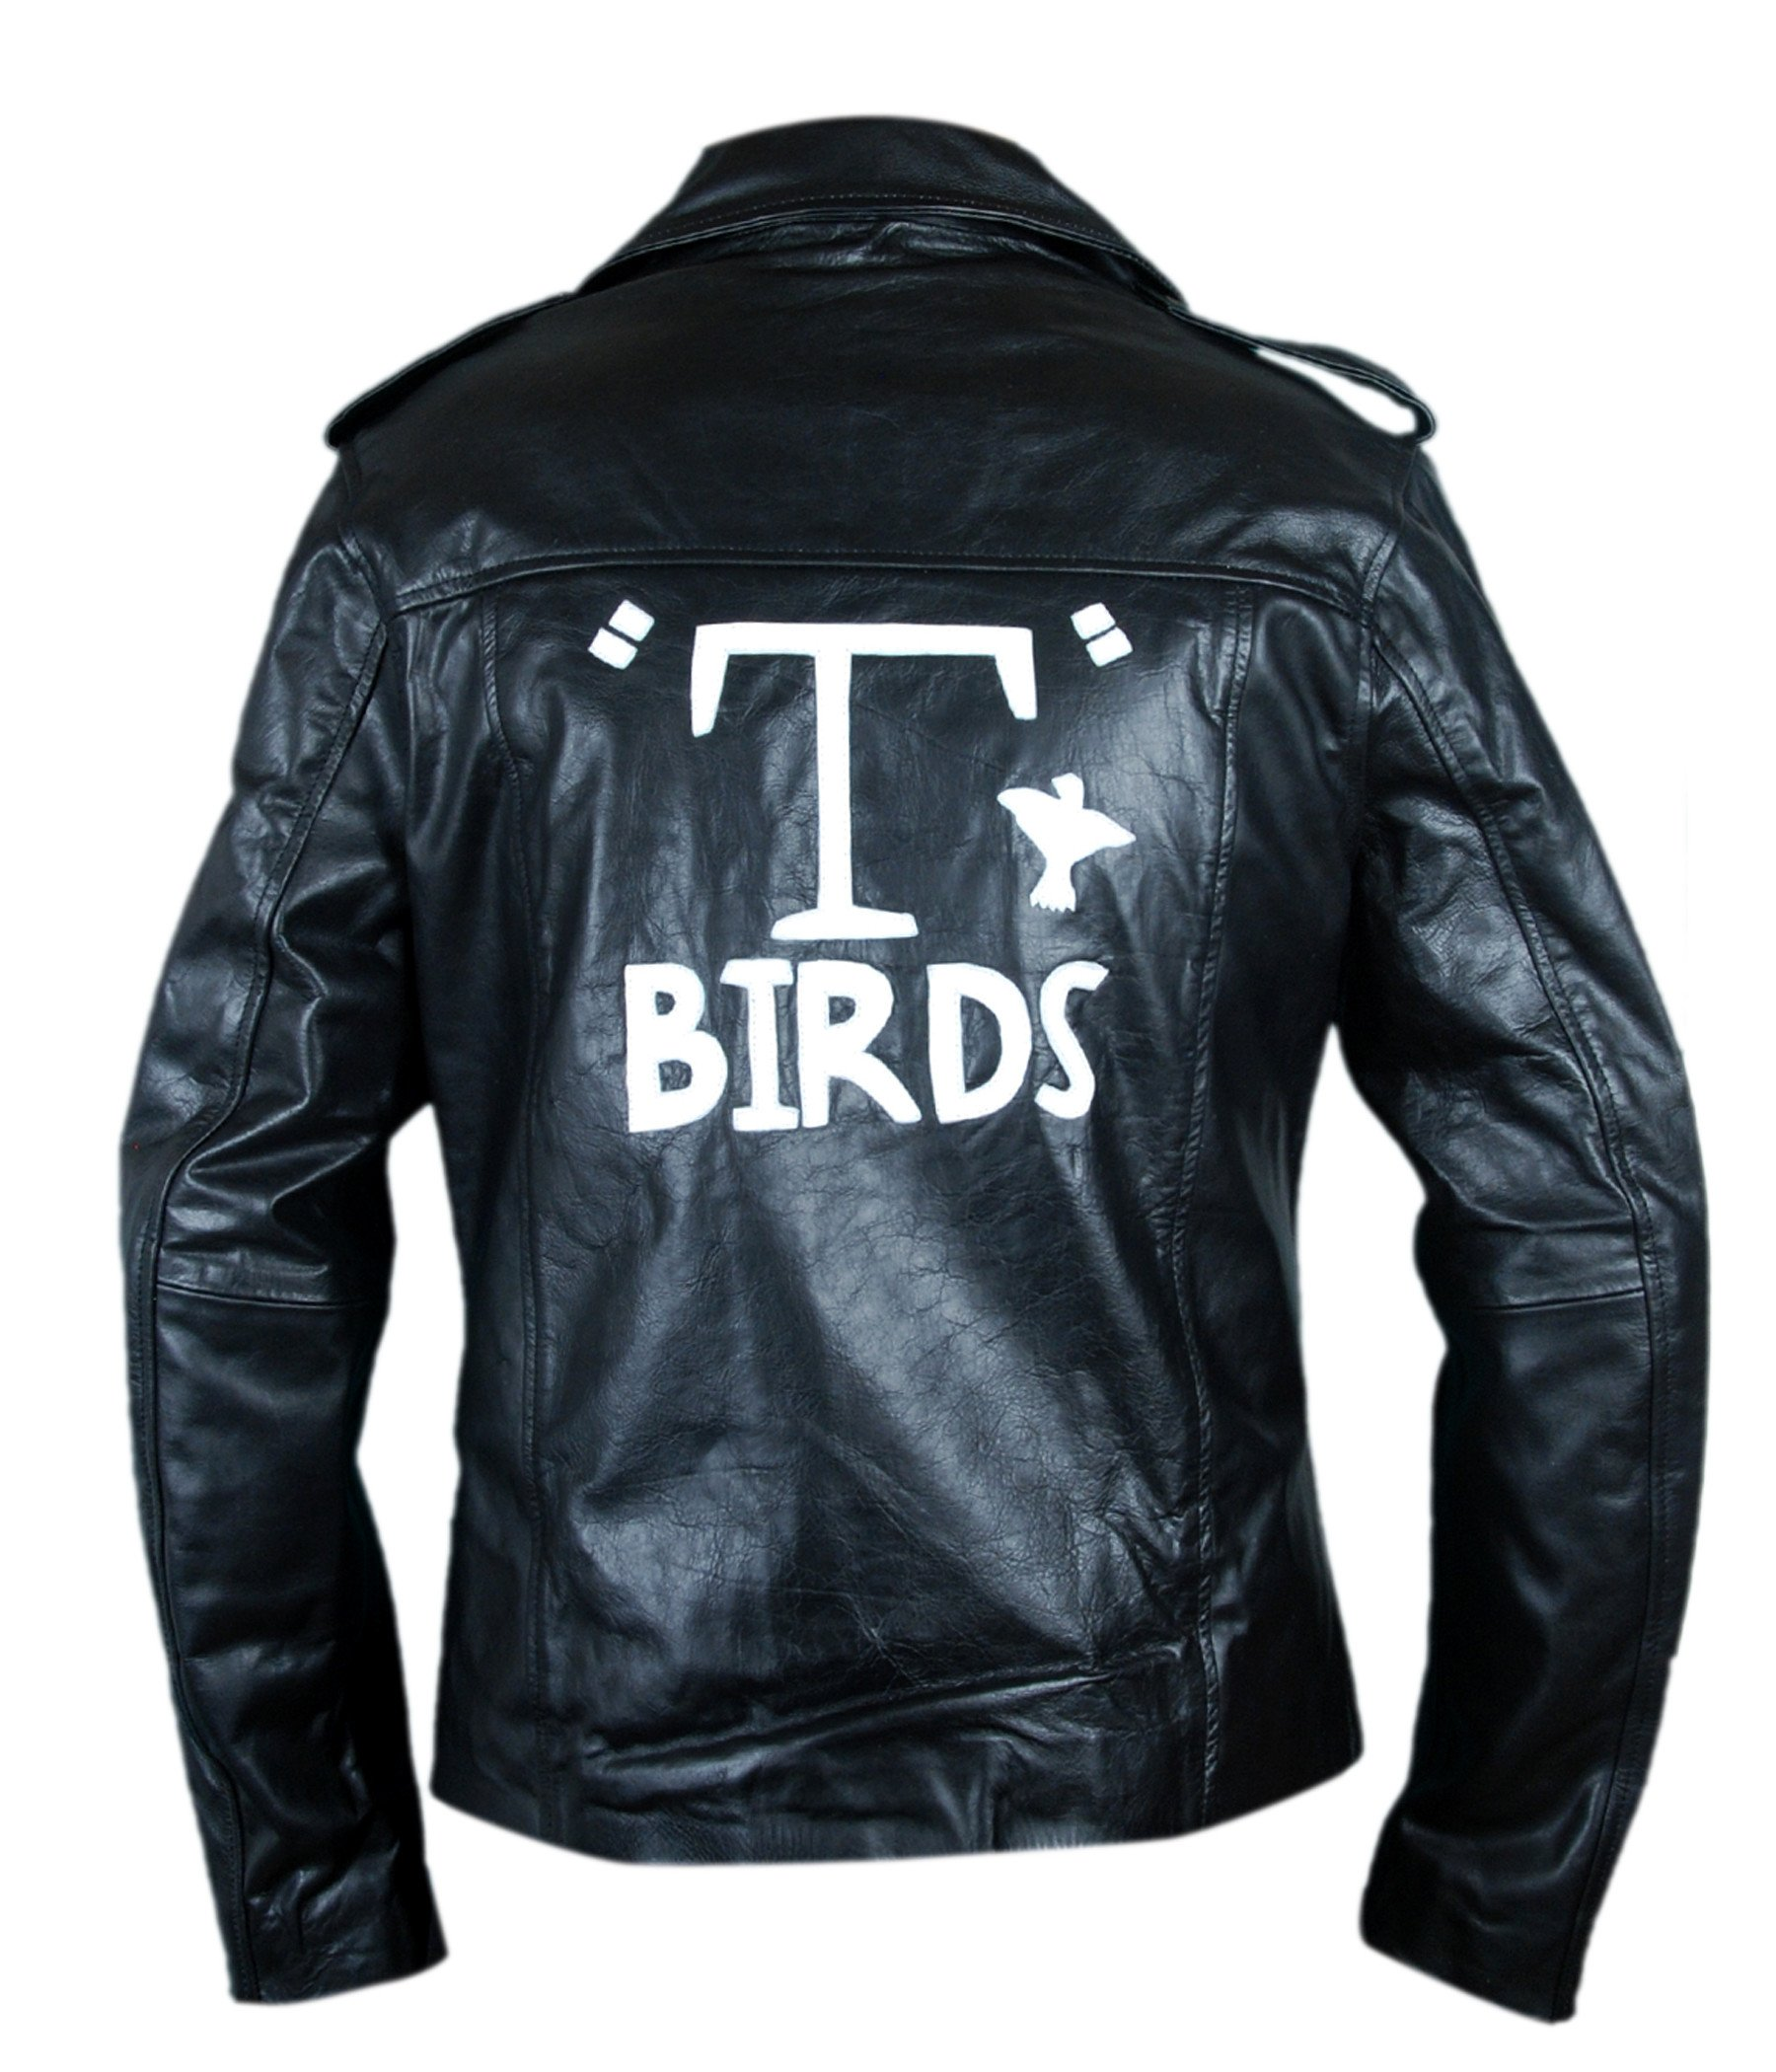 F&H Men's Grease T Birds Danny Zuko John Travolta Jacket XL Black by Flesh & Hide